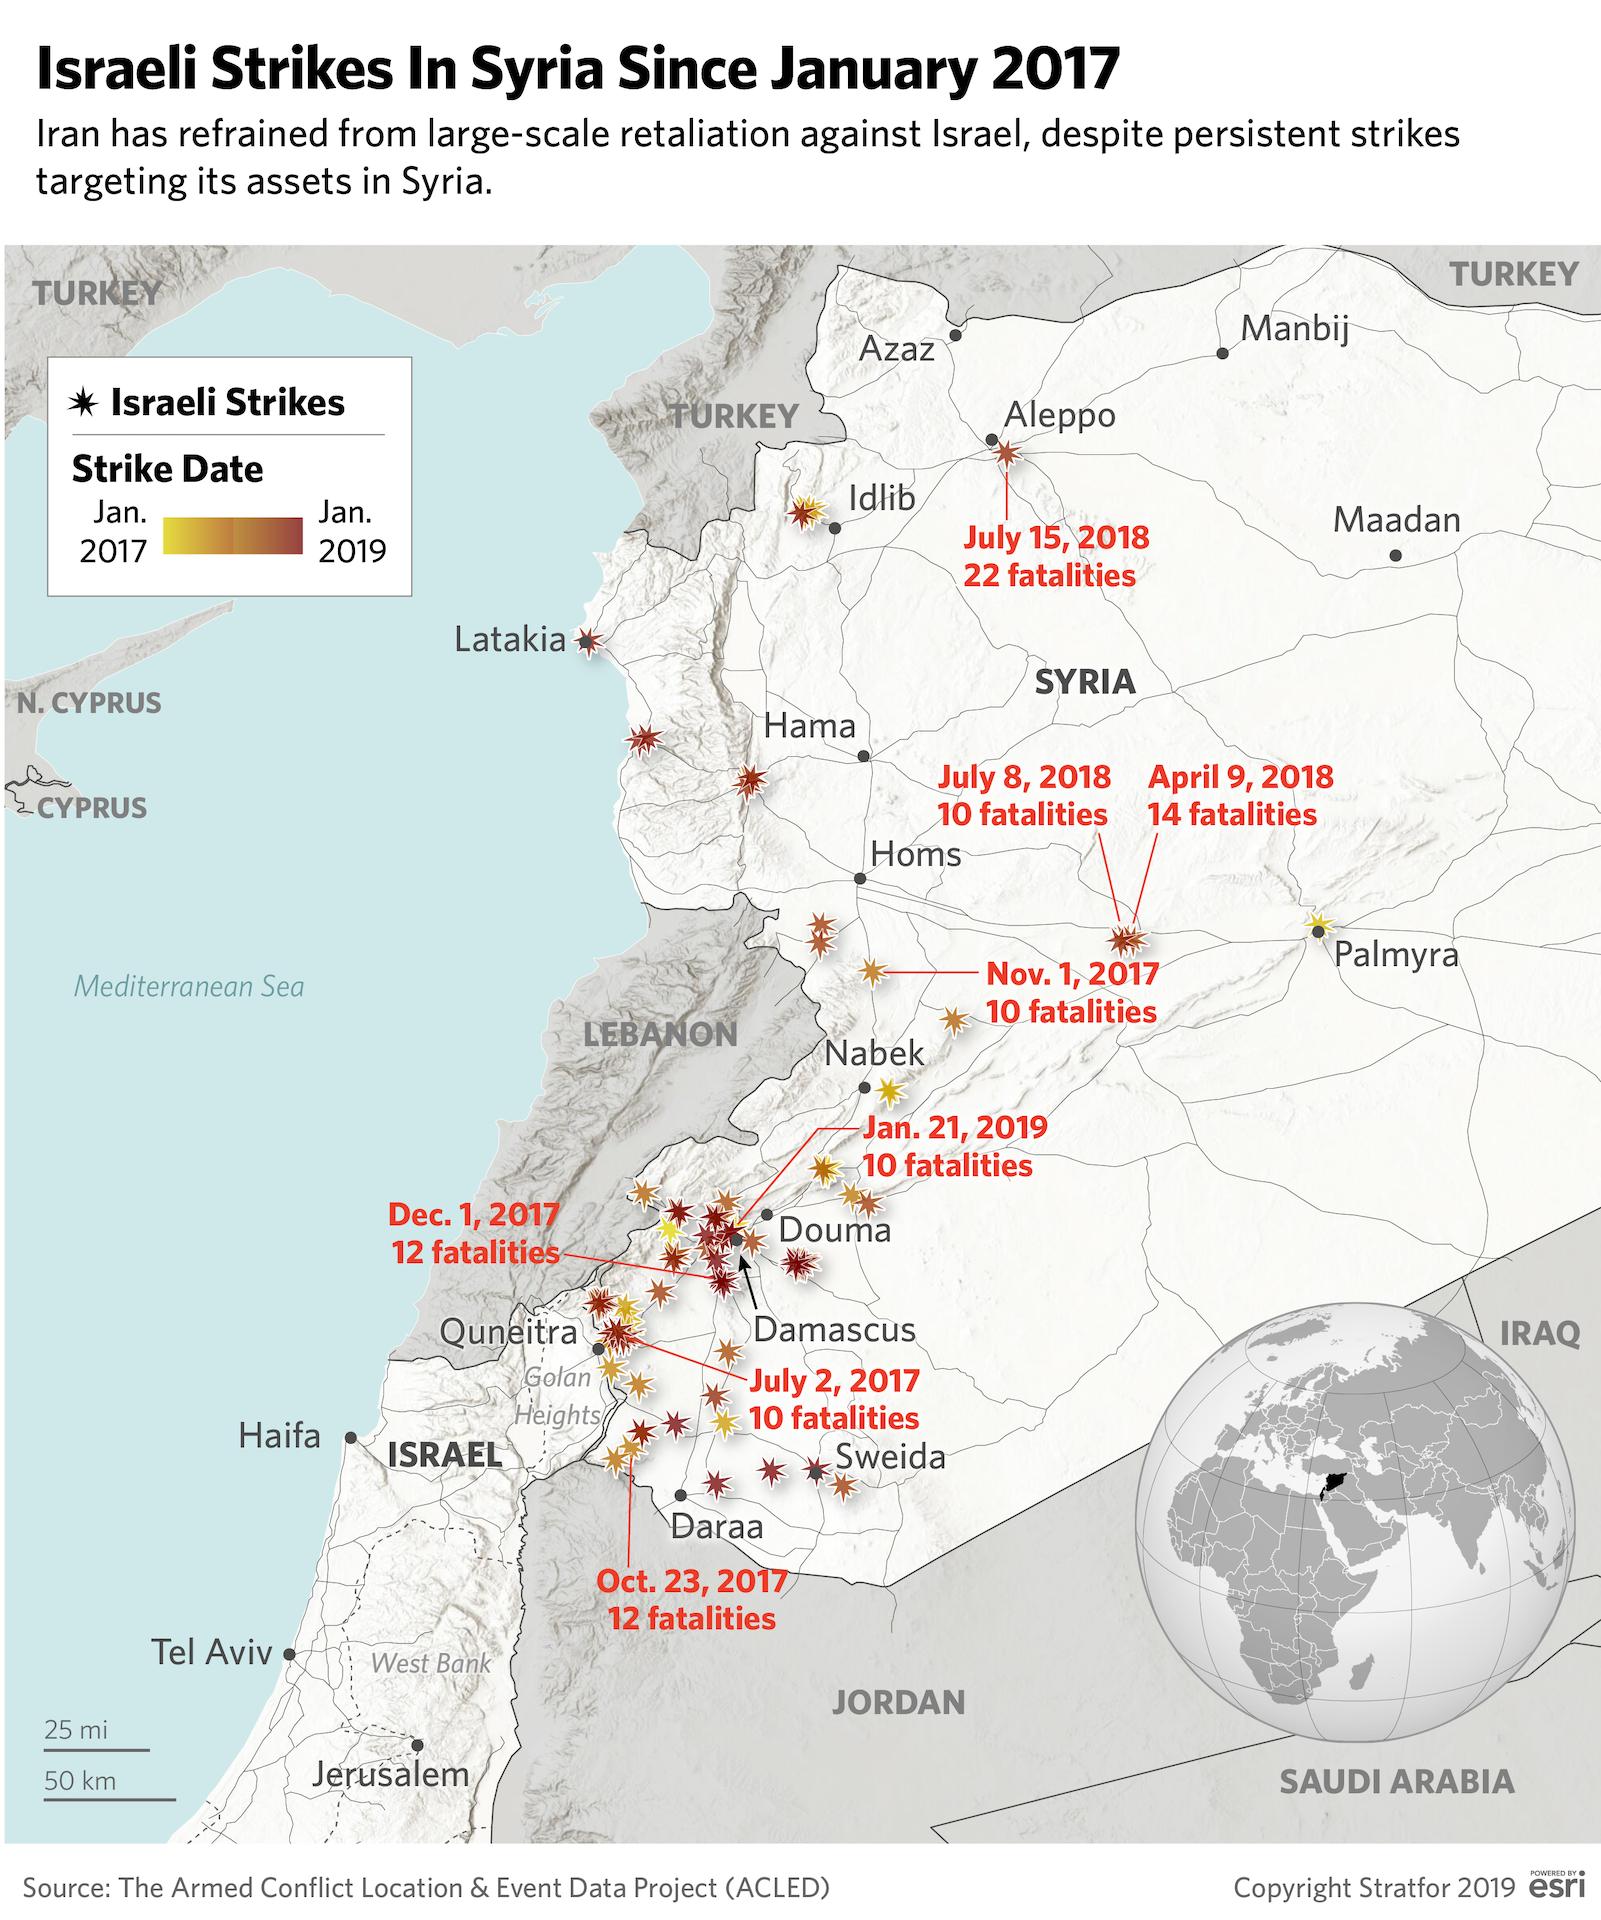 Iran Holds Off On Retaliating To Israeli Strikes In Syria Syria Israeli Quds Force